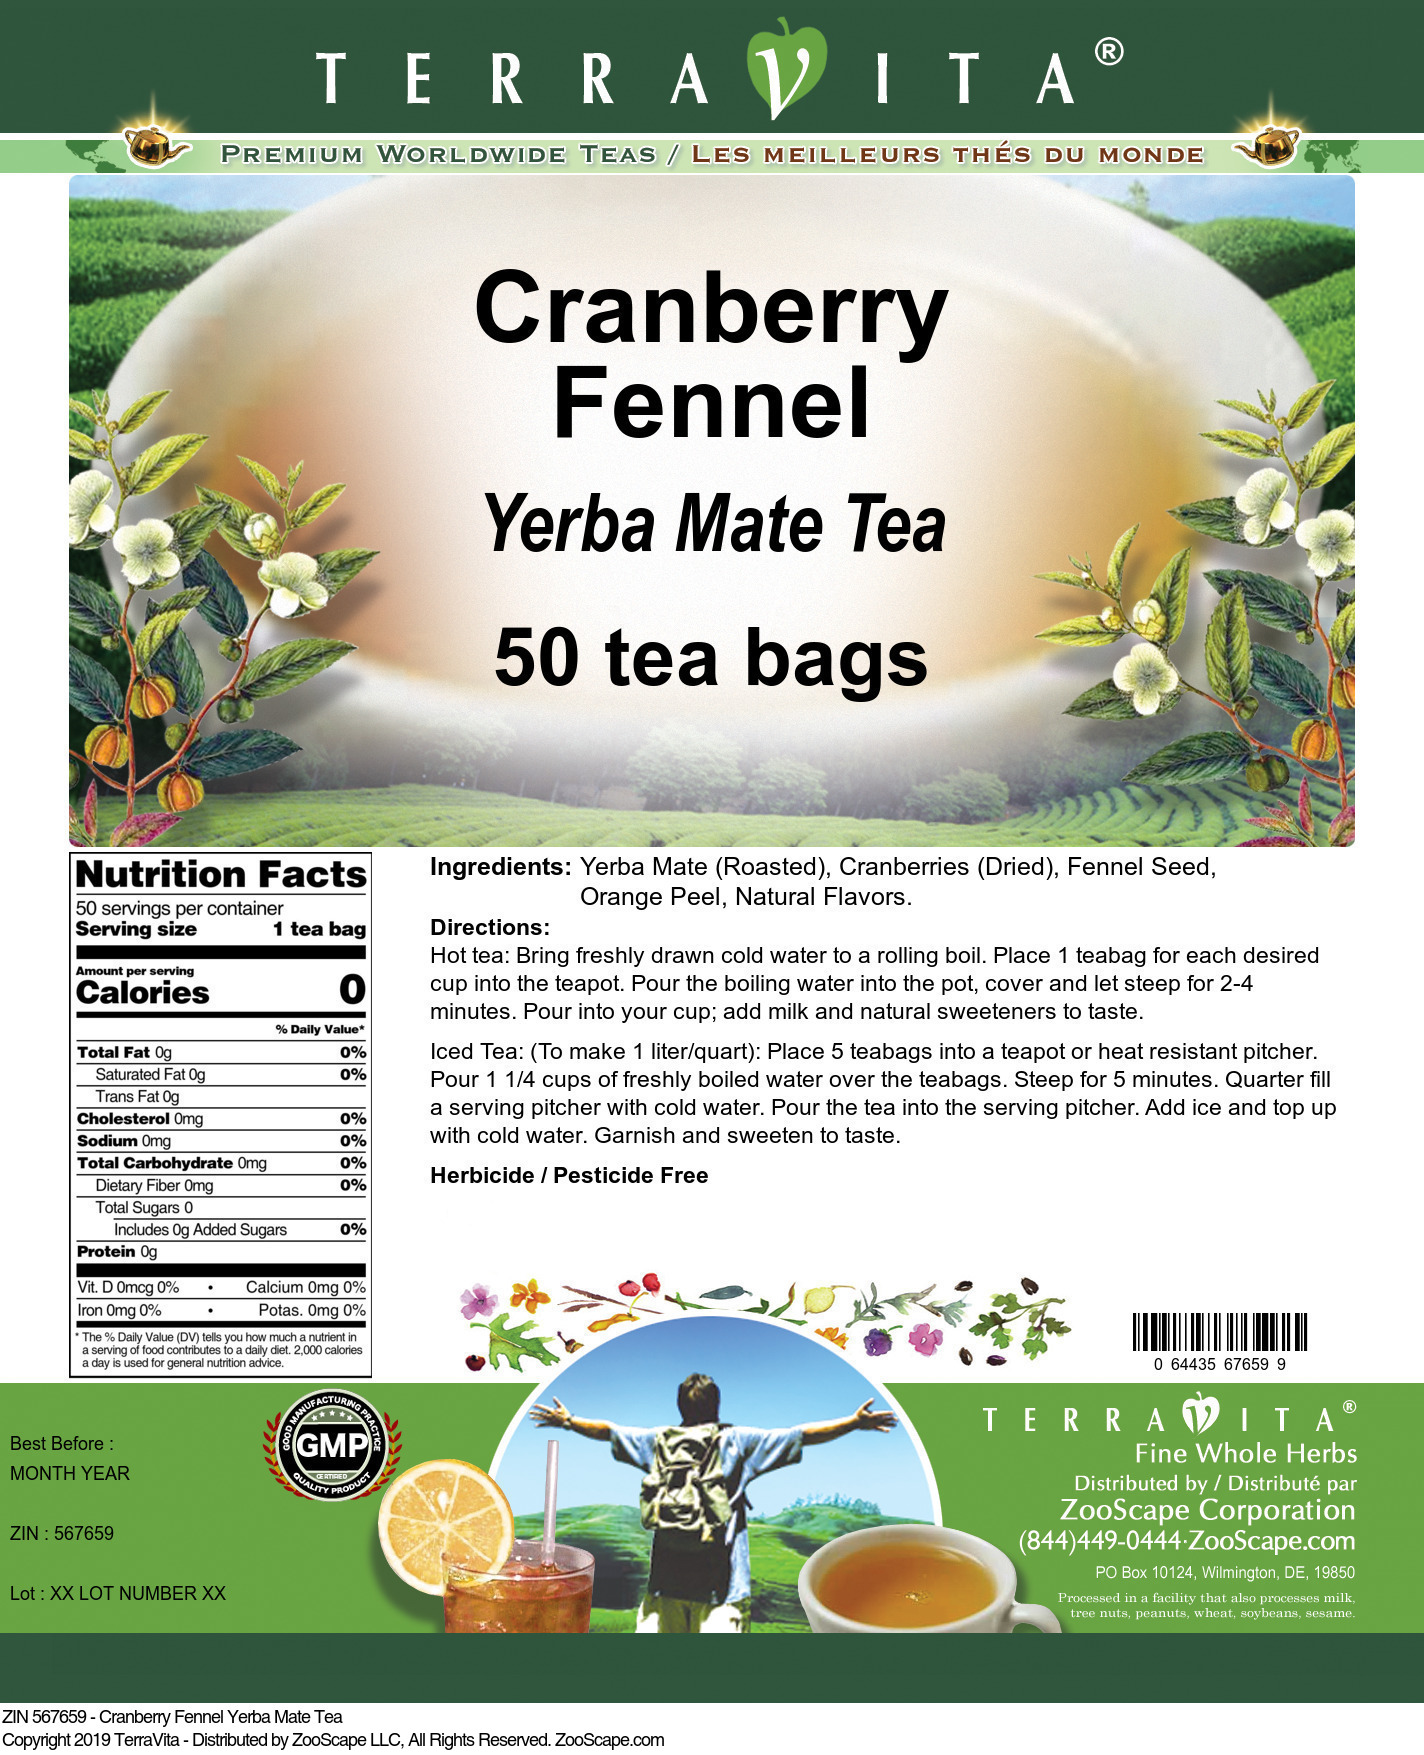 Cranberry Fennel Yerba Mate Tea